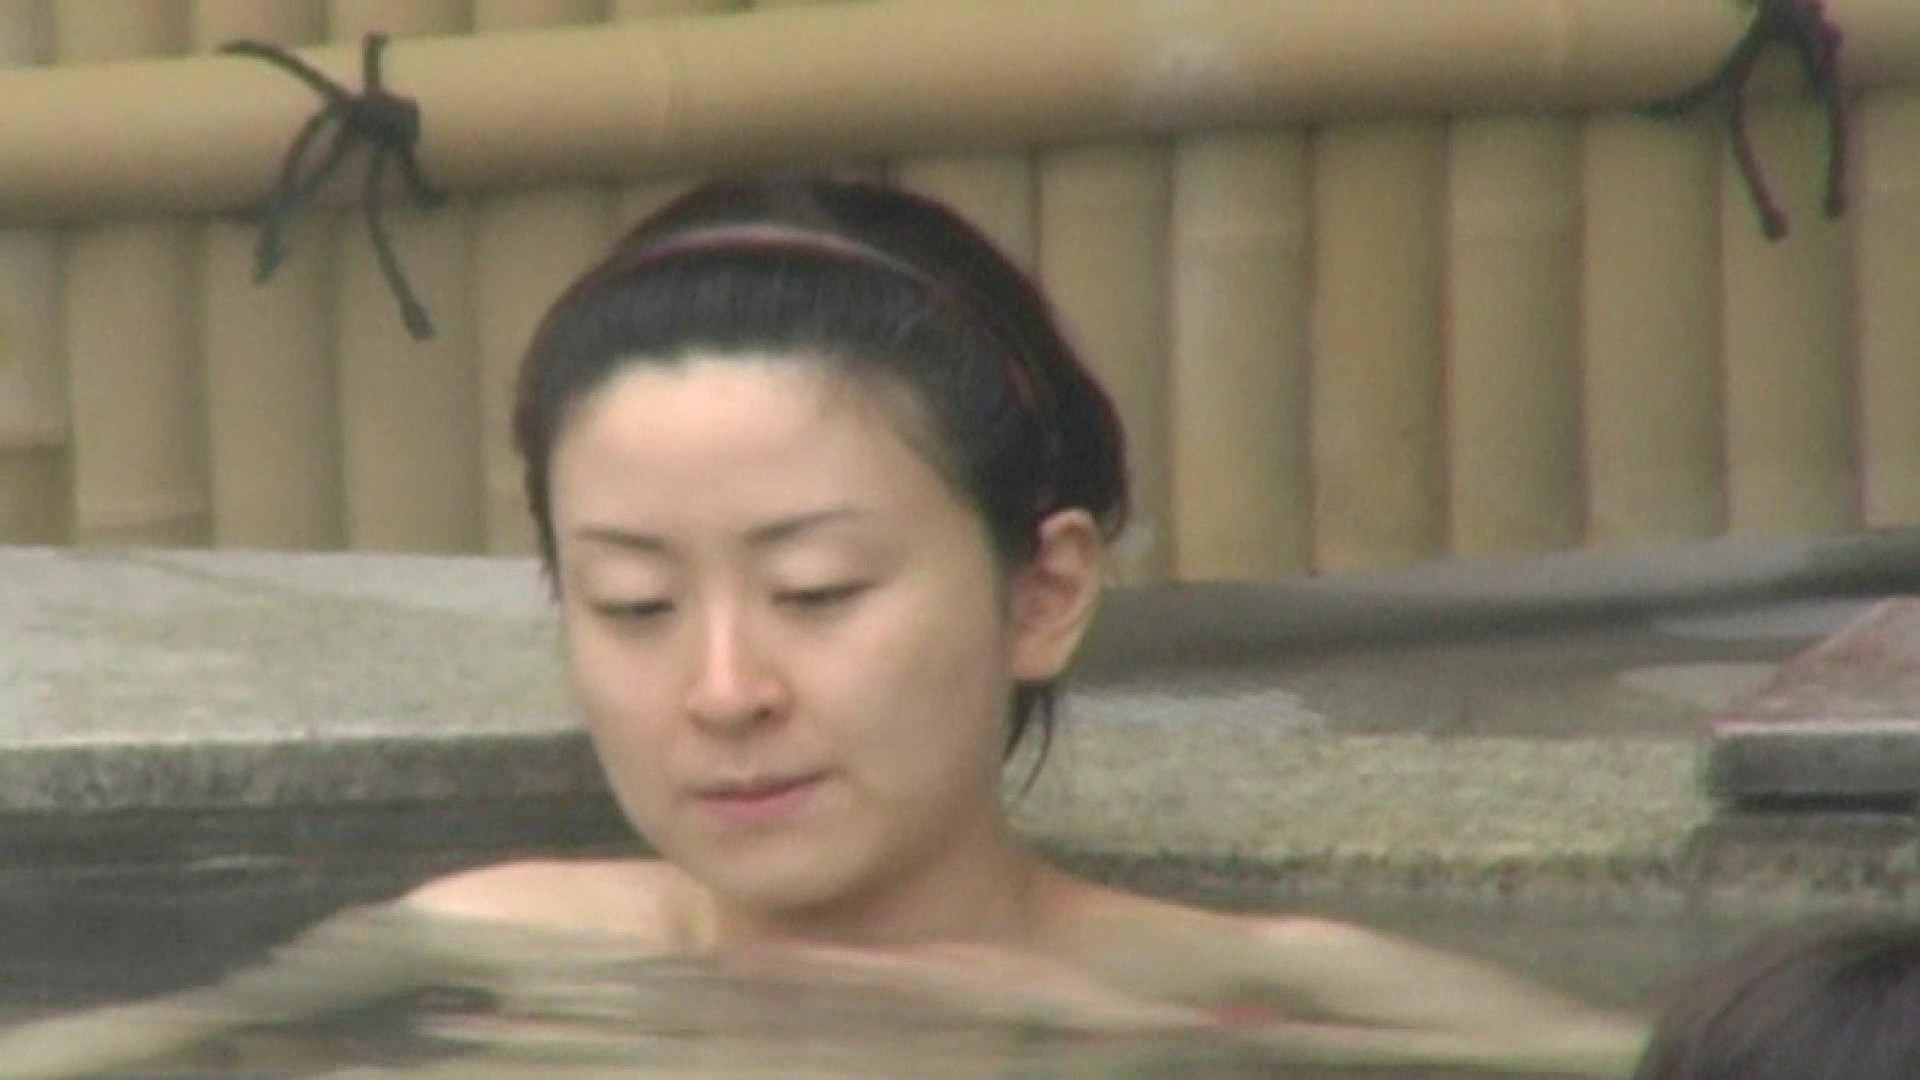 Aquaな露天風呂Vol.548 盗撮  97連発 21